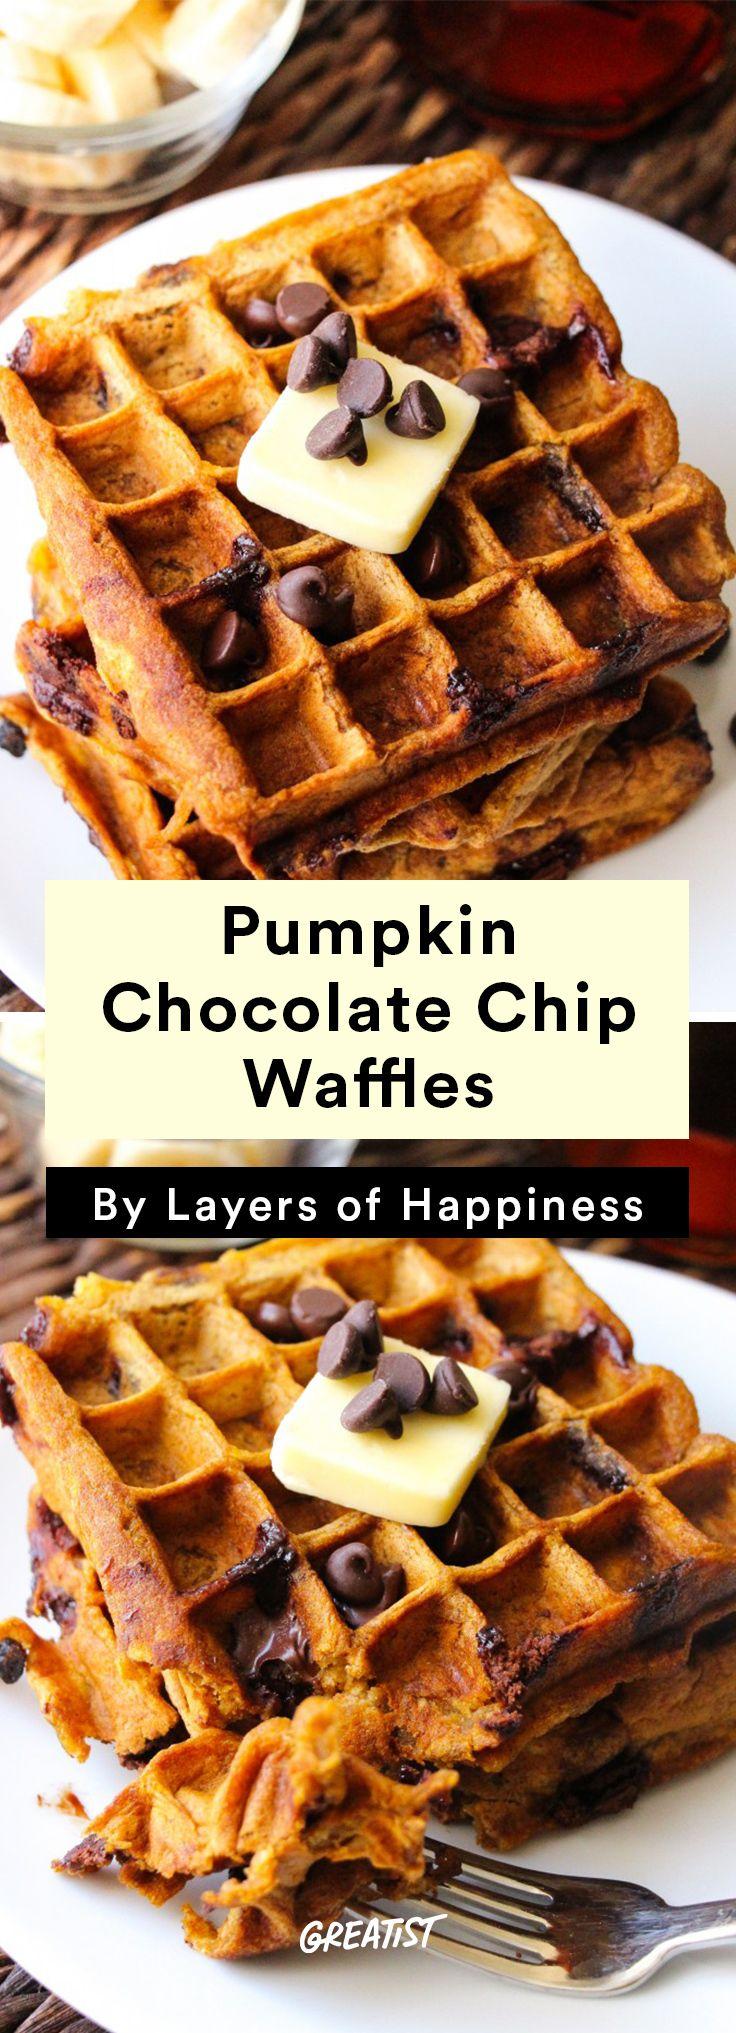 4. Pumpkin Chocolate Chip Waffles  #healthy #fall #brunch #recipes http://greatist.com/eat/brunch-recipes-for-fall